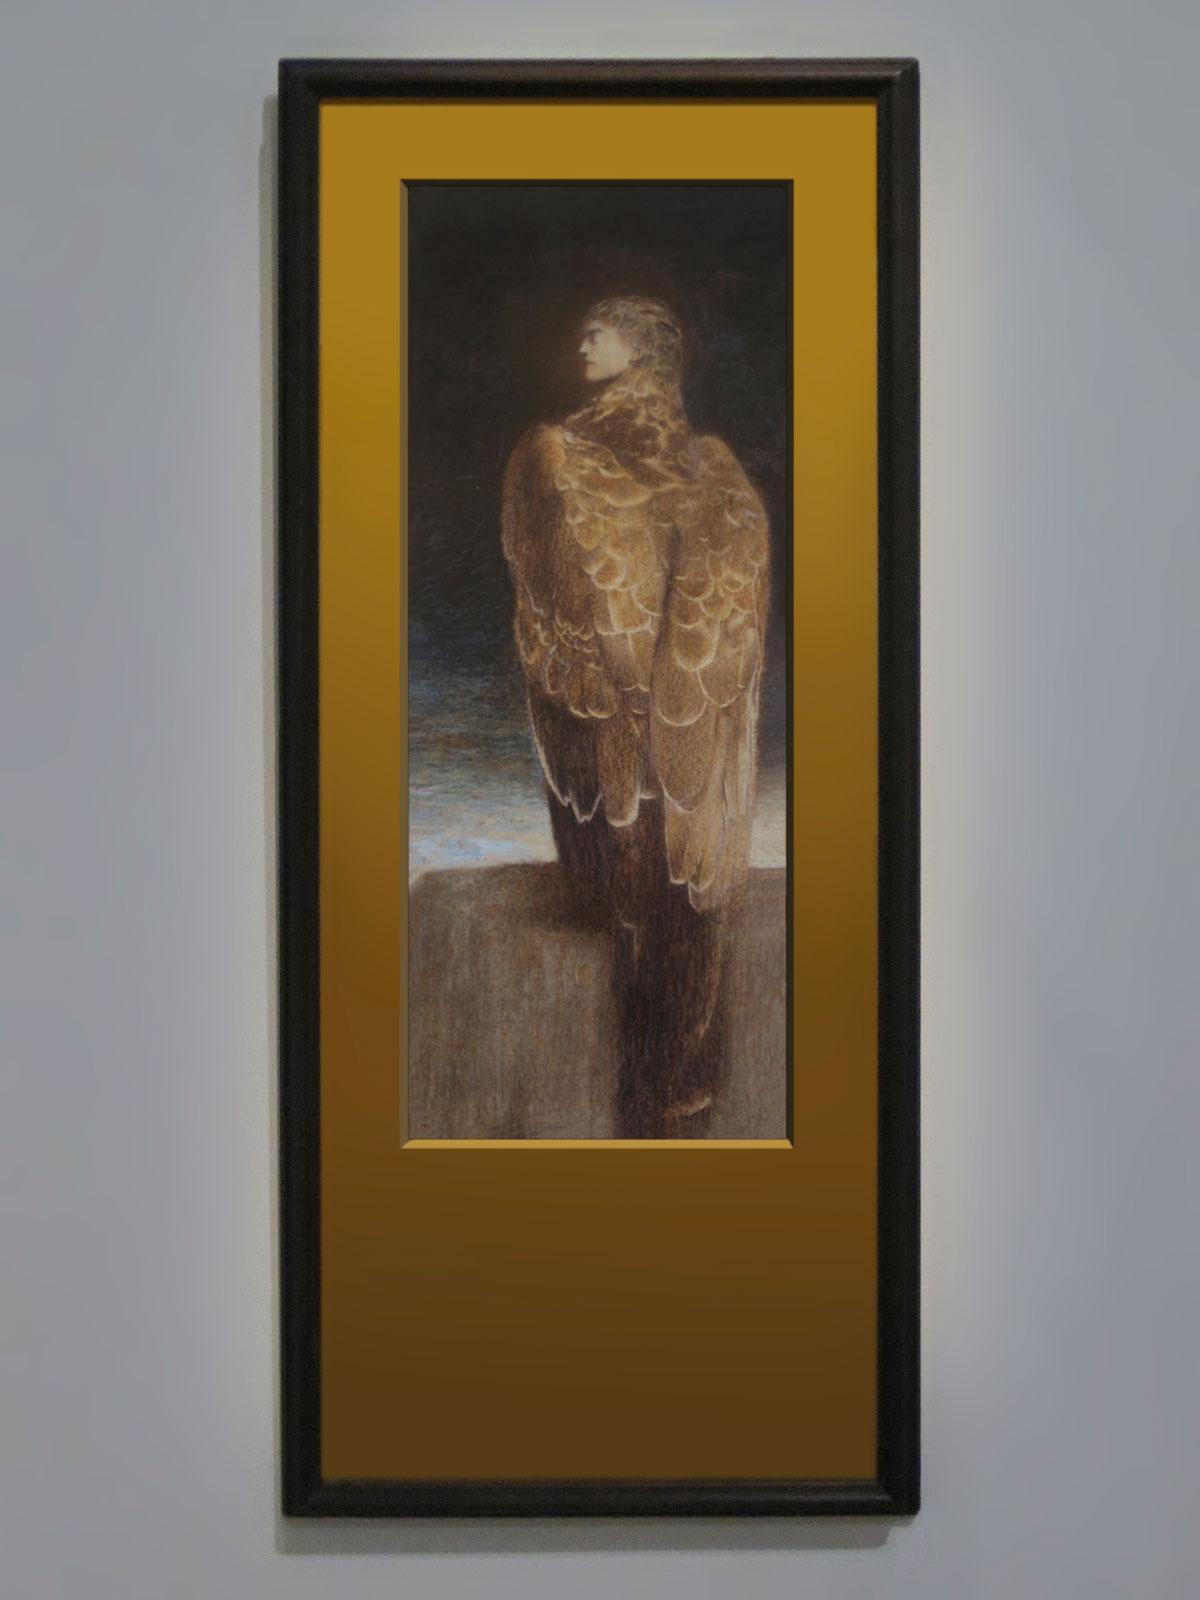 Fernand Khnopff, La Méduse endormie, 1896